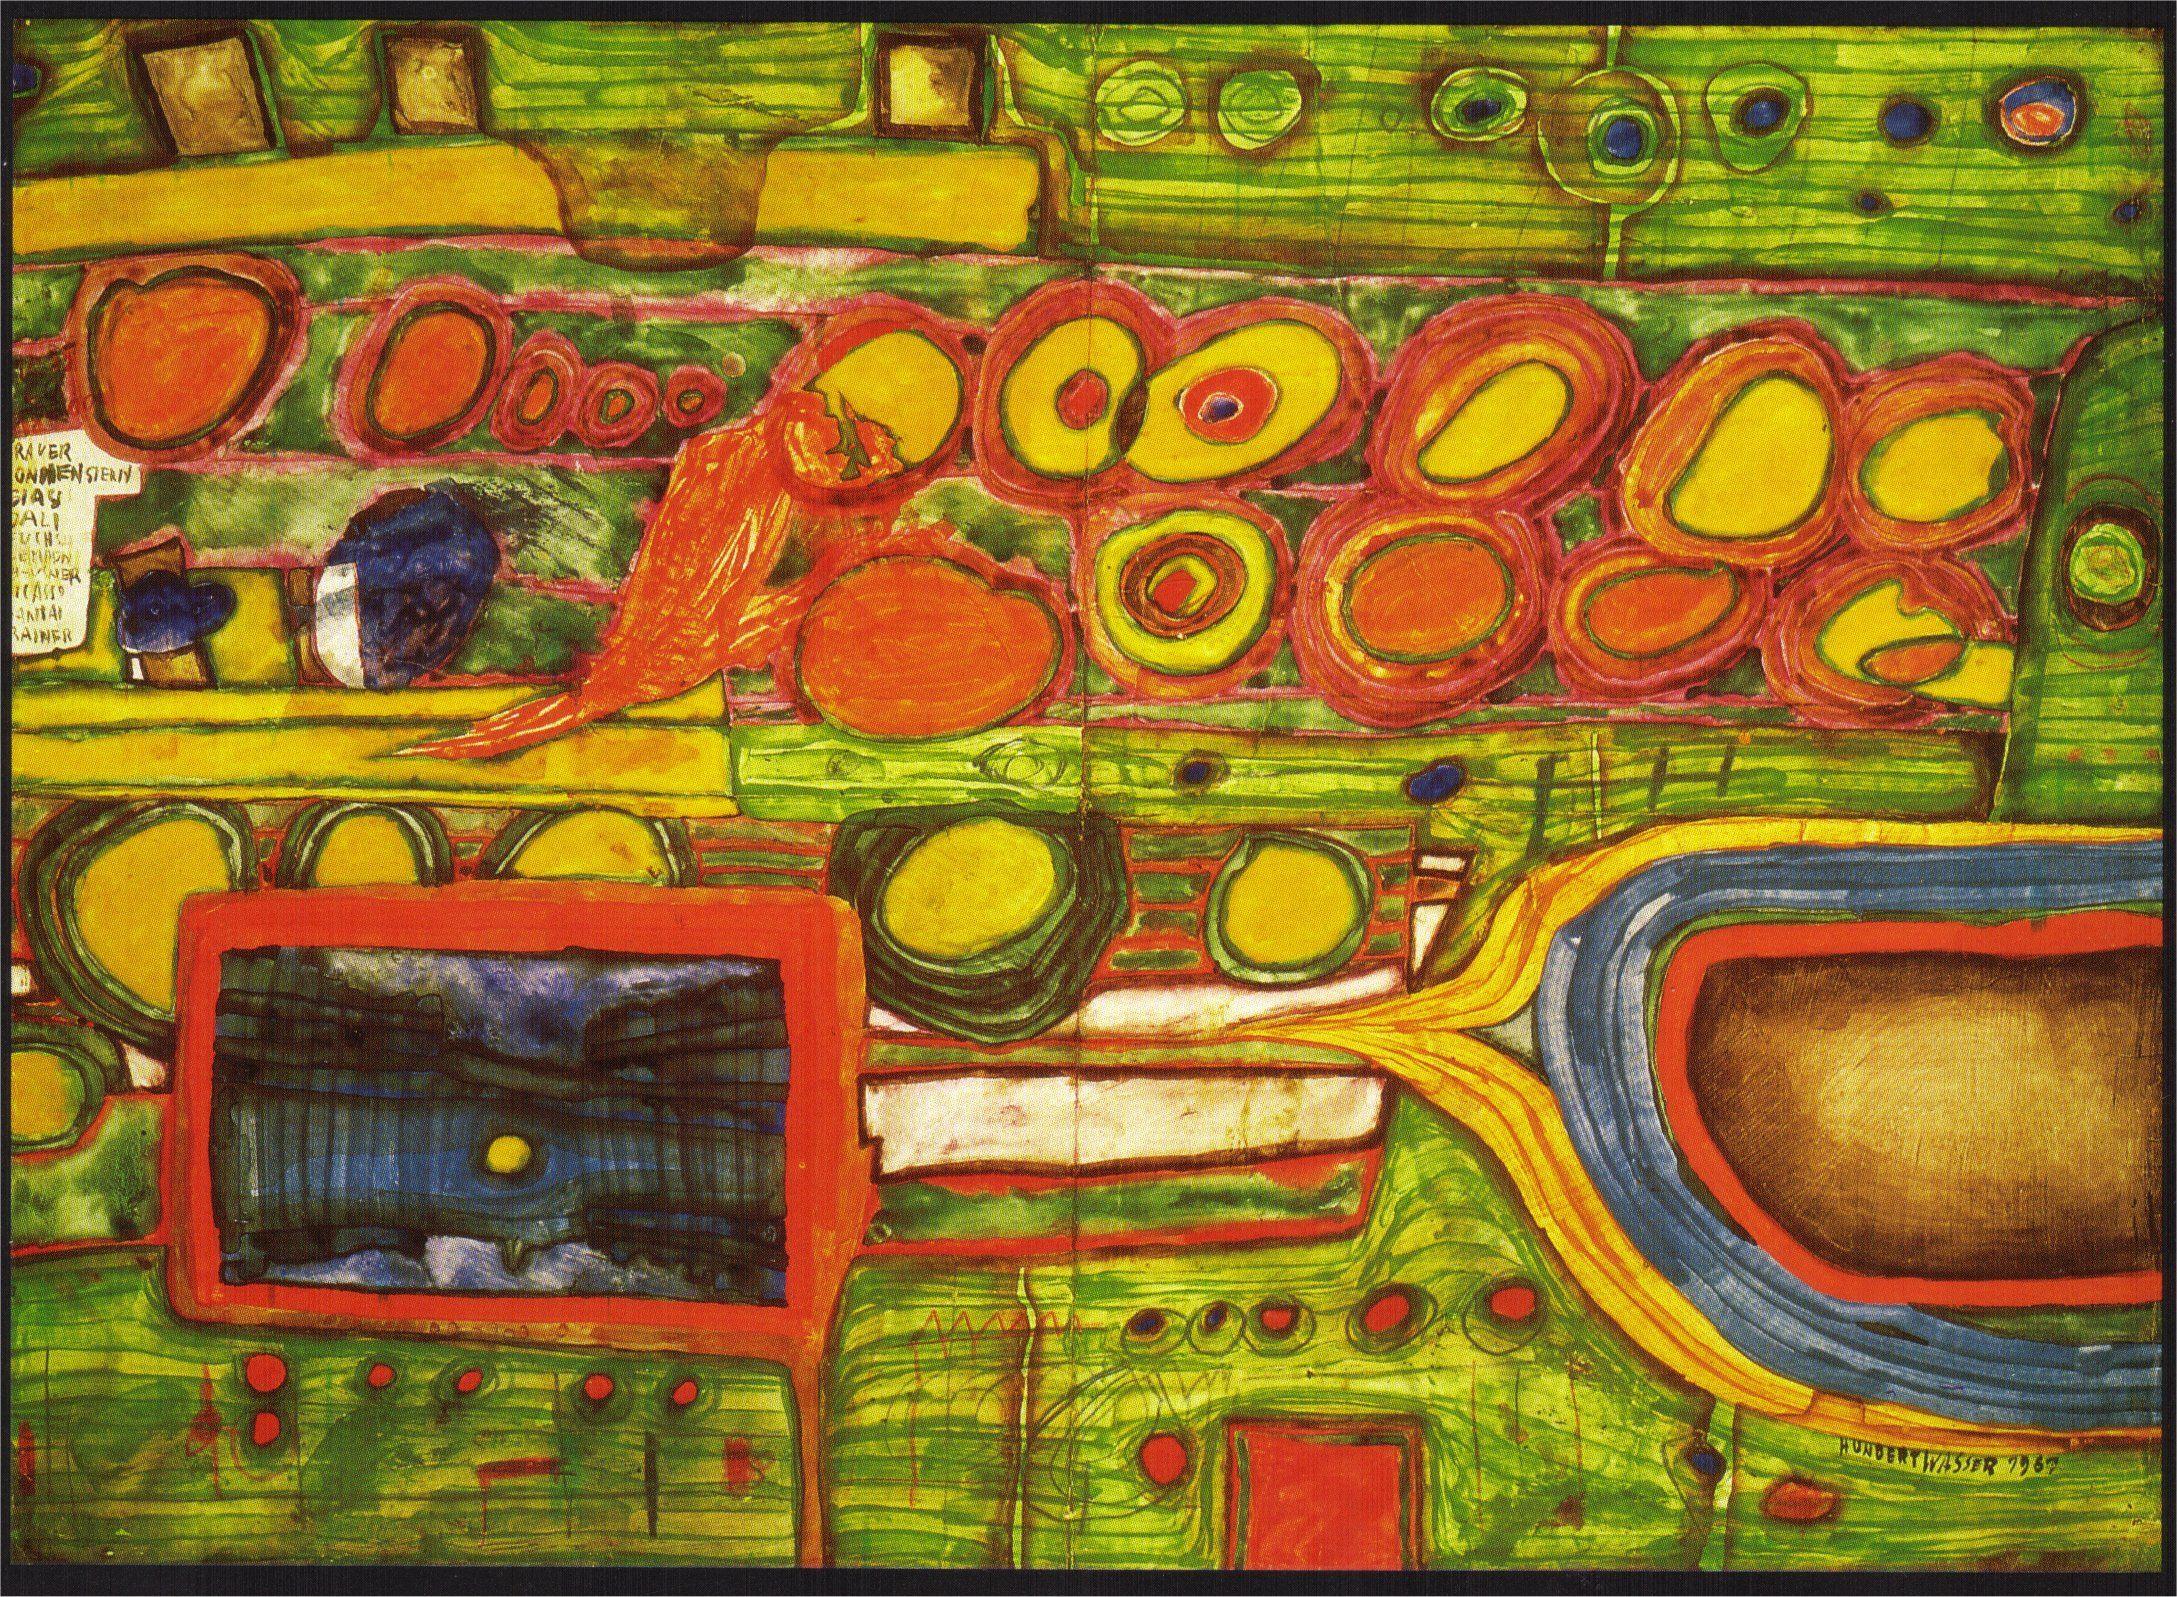 Hundertwasser-Paintings-1961-the-hokkaido-steamship.jpg (2177×1597 ...